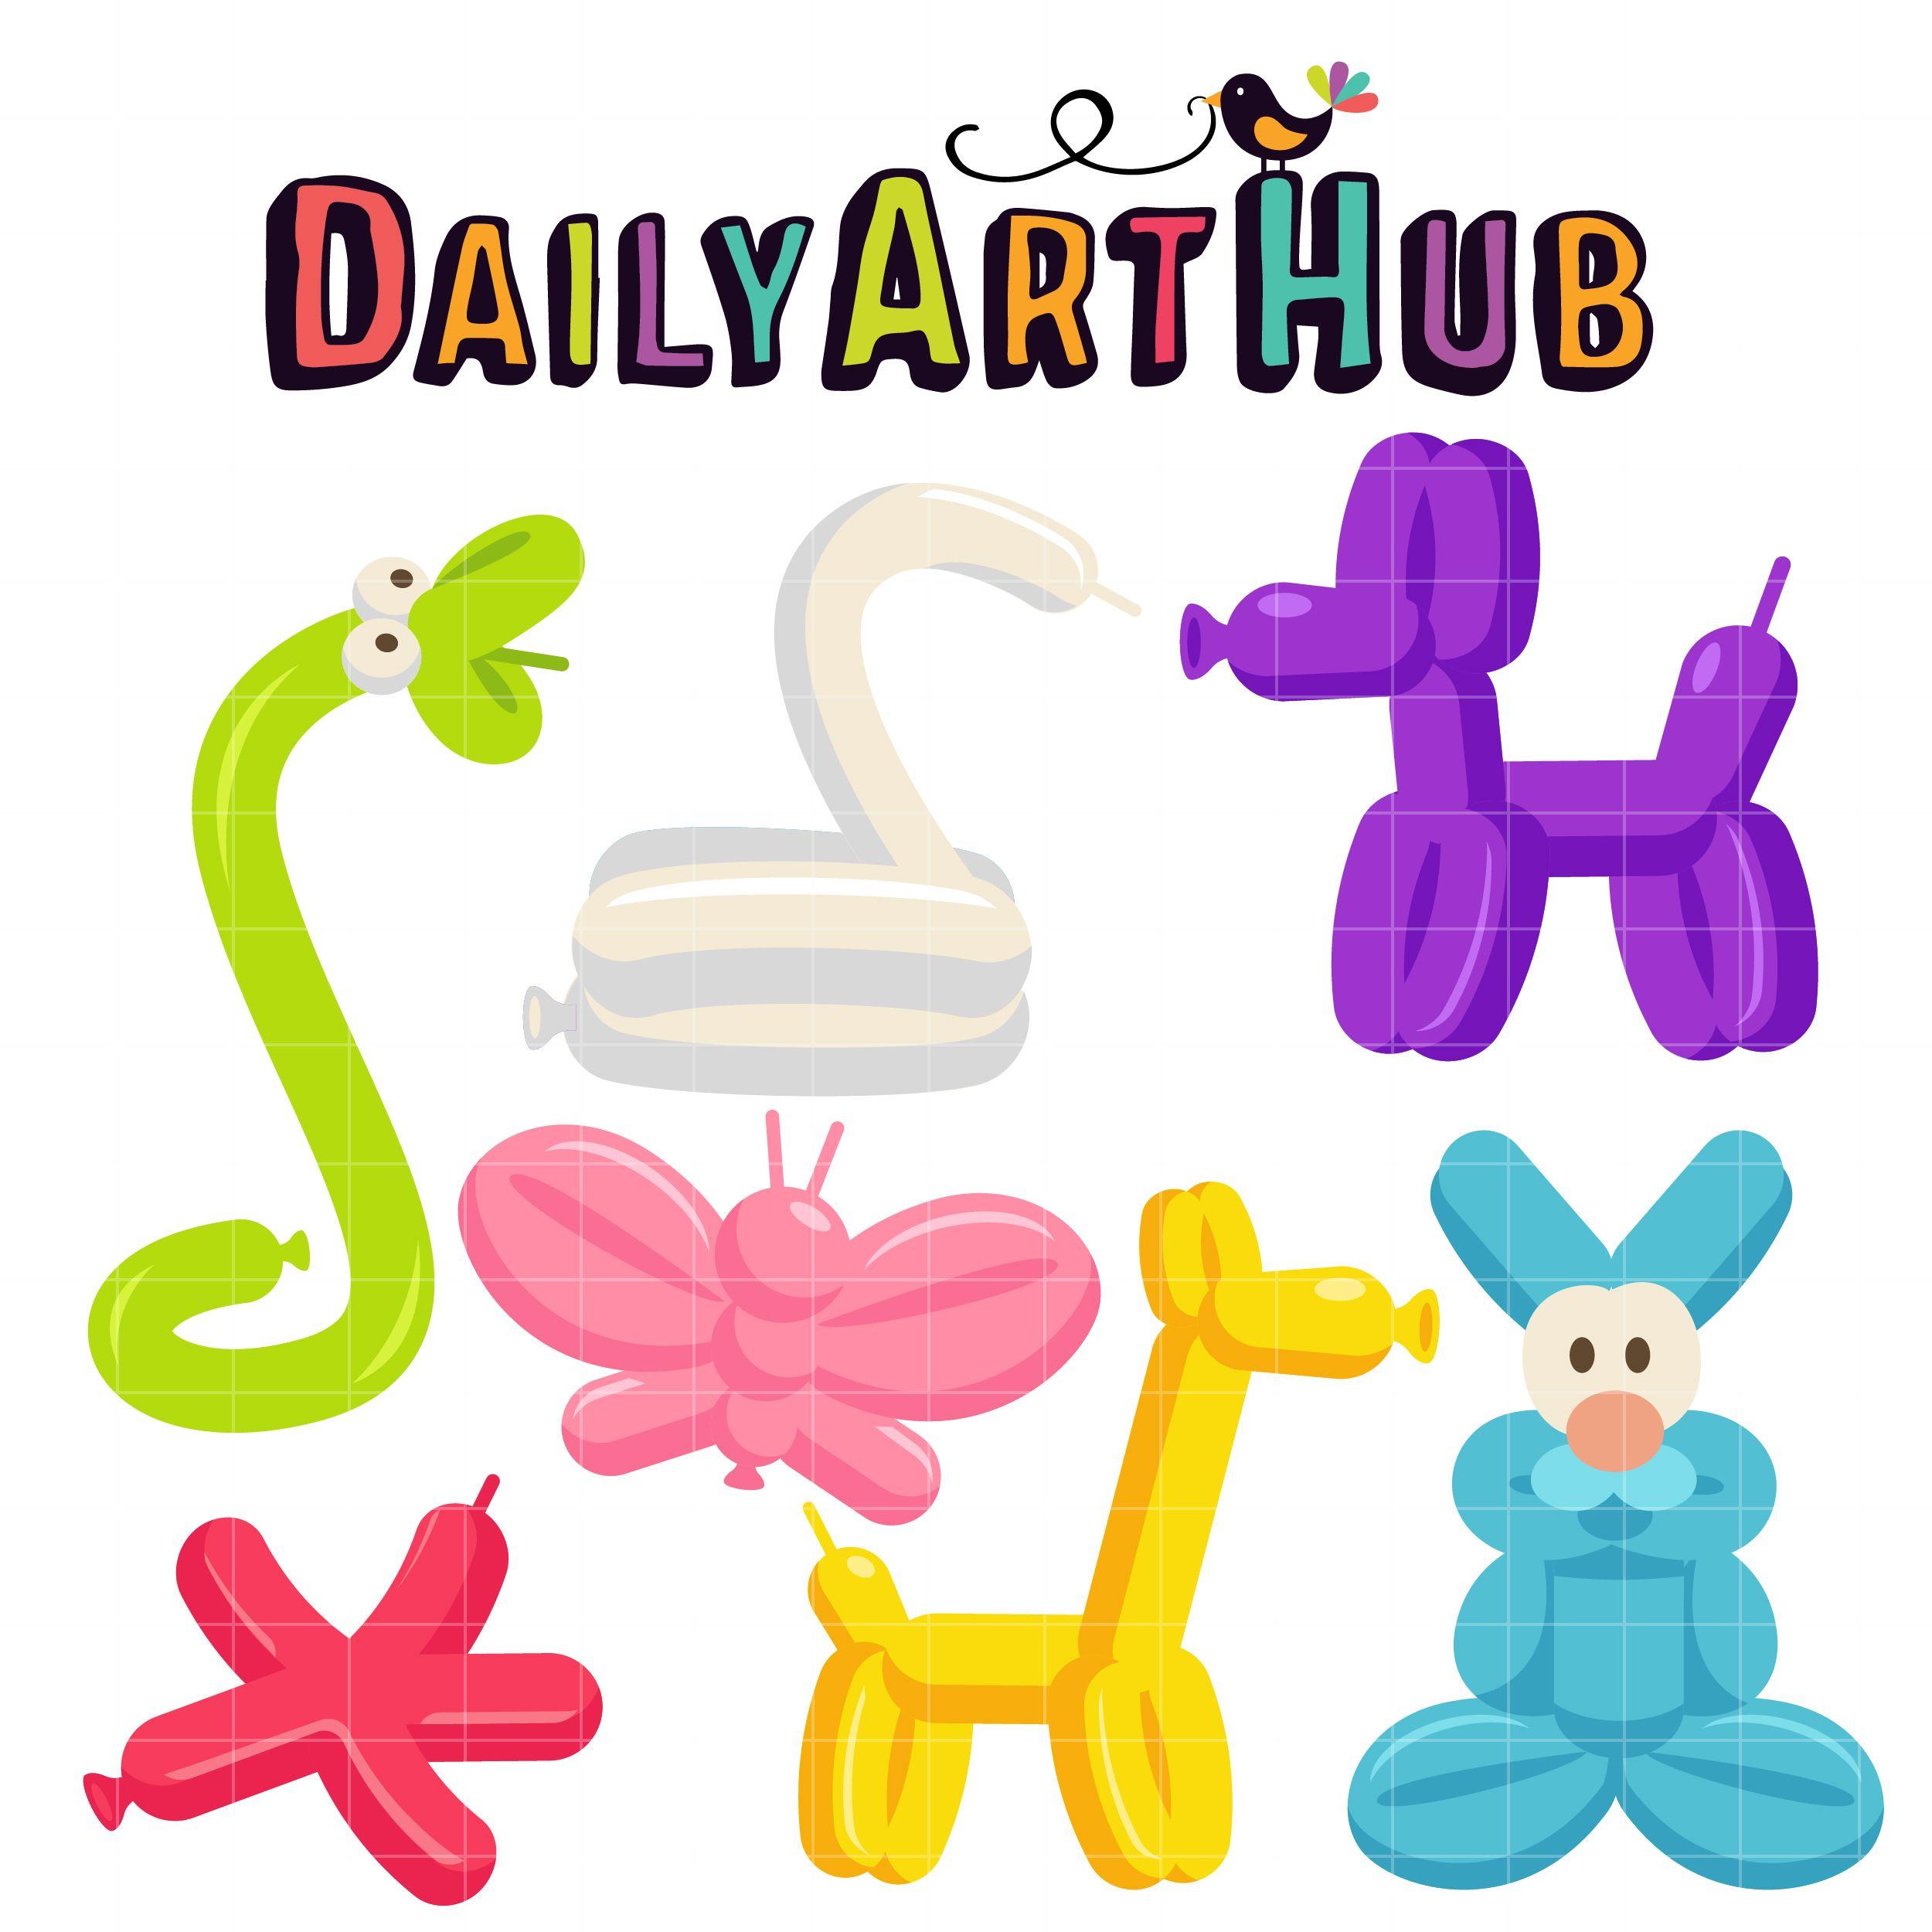 Balloon Animals Clip Art Set Daily Art Hub Free Clip Art Everyday Balloon Animals Clip Art Balloons